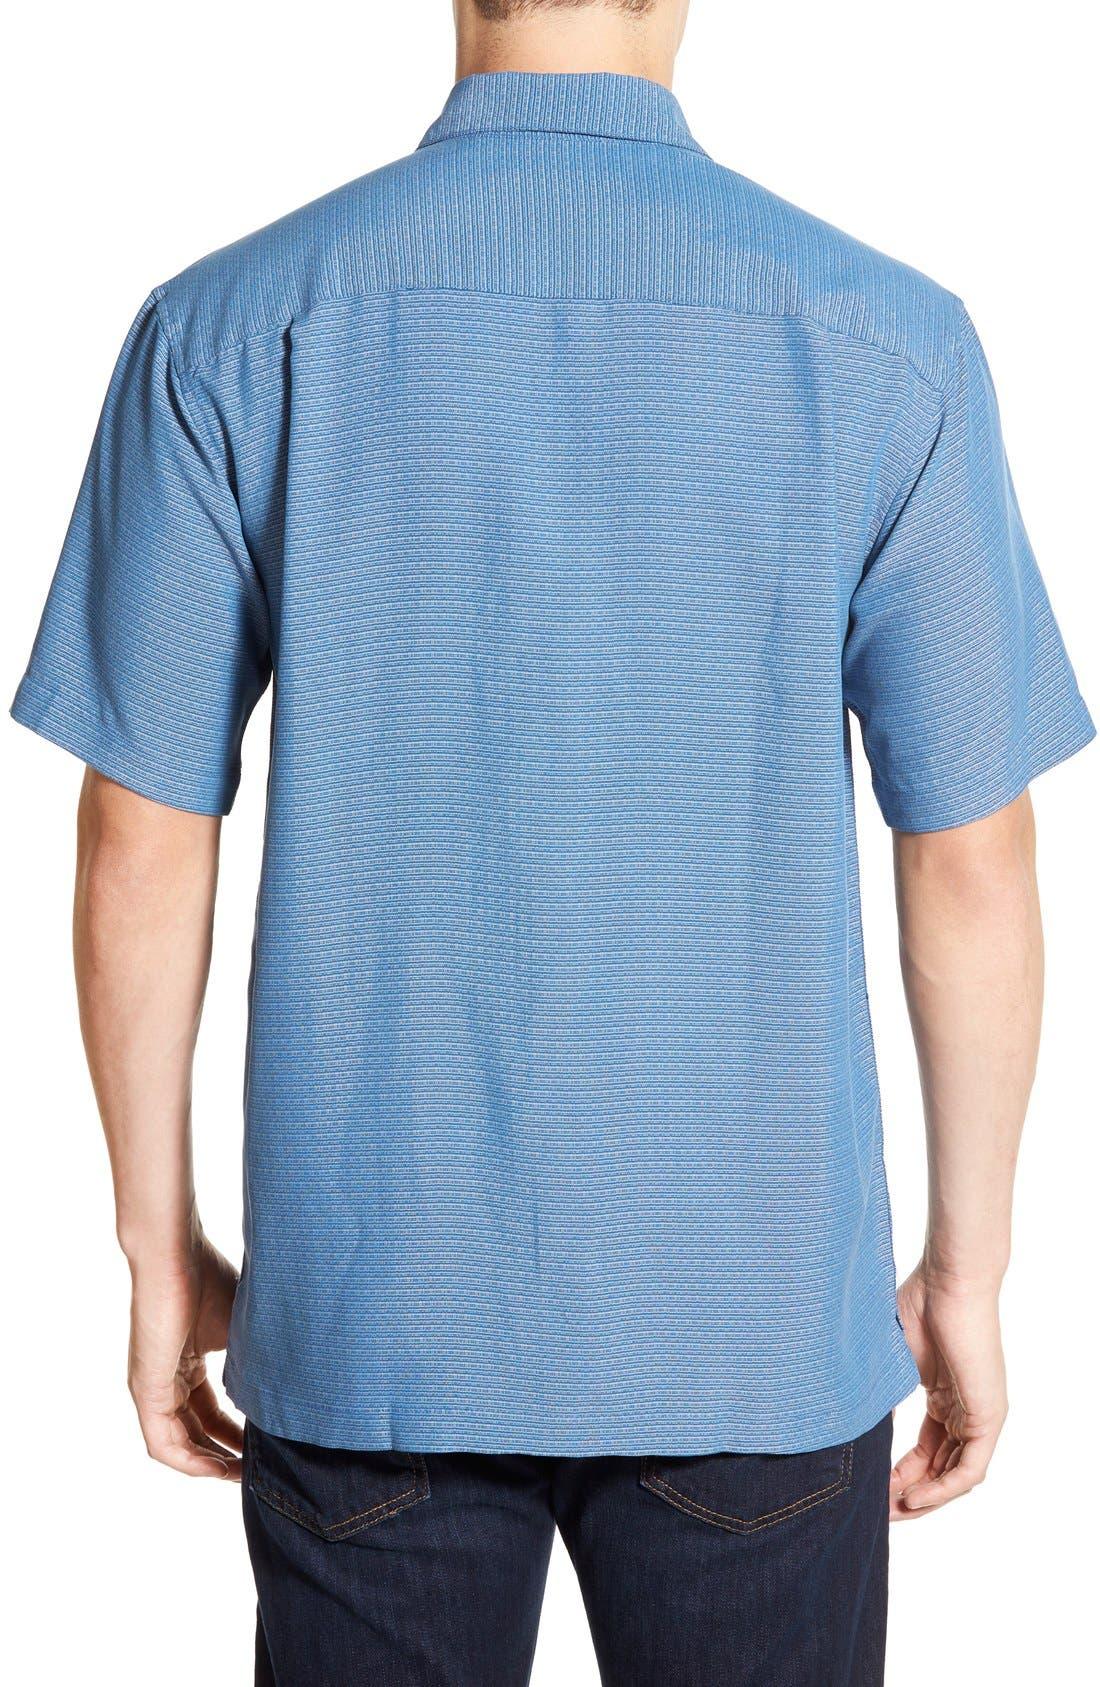 'Wind N Sea' Regular Fit Sport Shirt,                             Alternate thumbnail 2, color,                             Navy